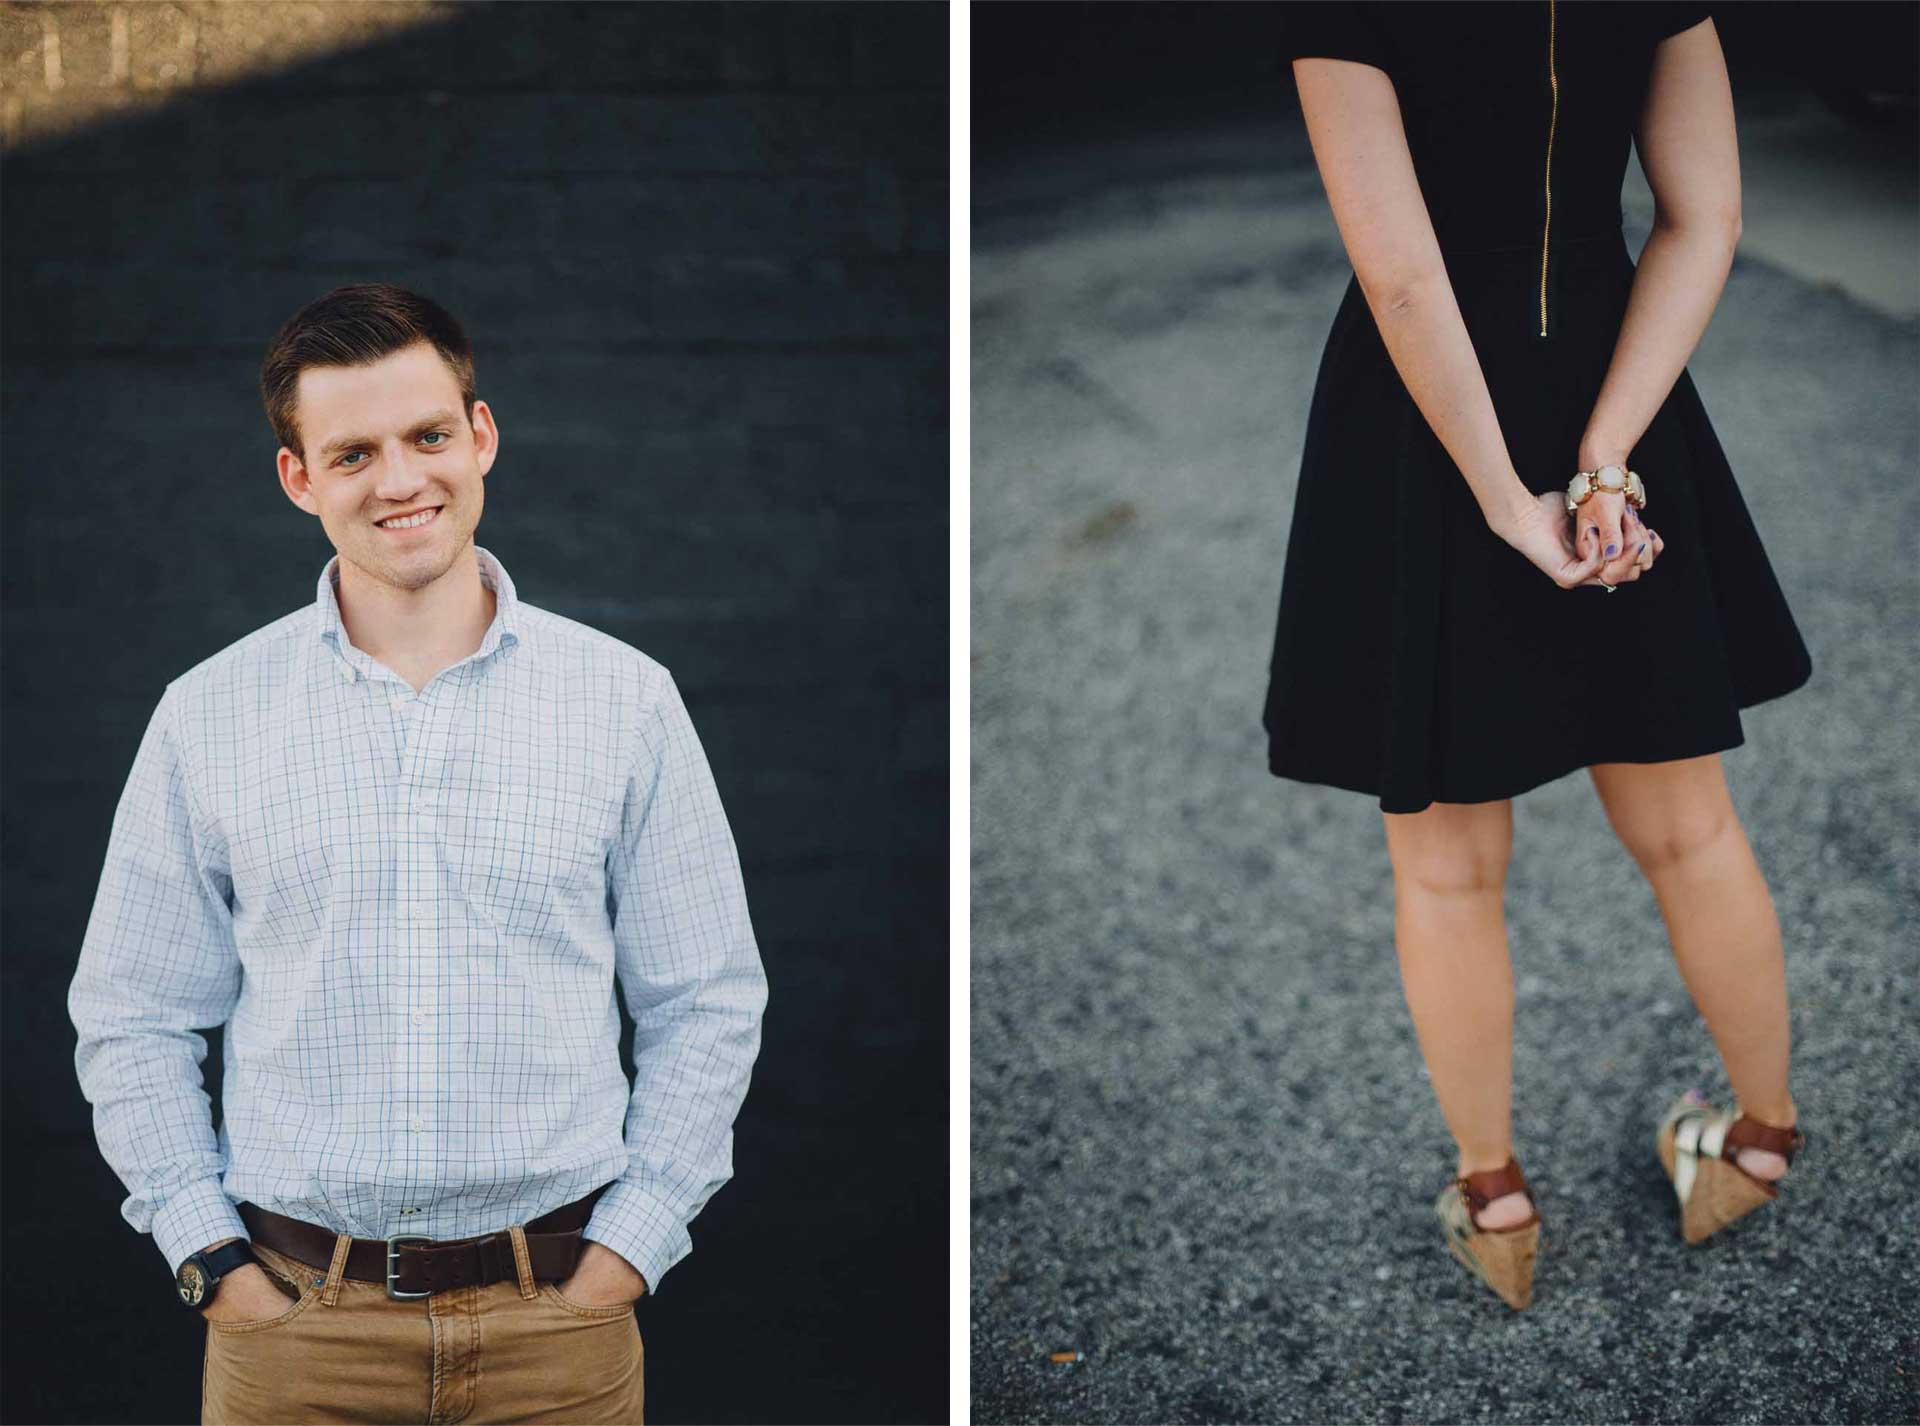 Emily-Dan-Dayton-Engagement-016@2x.jpg